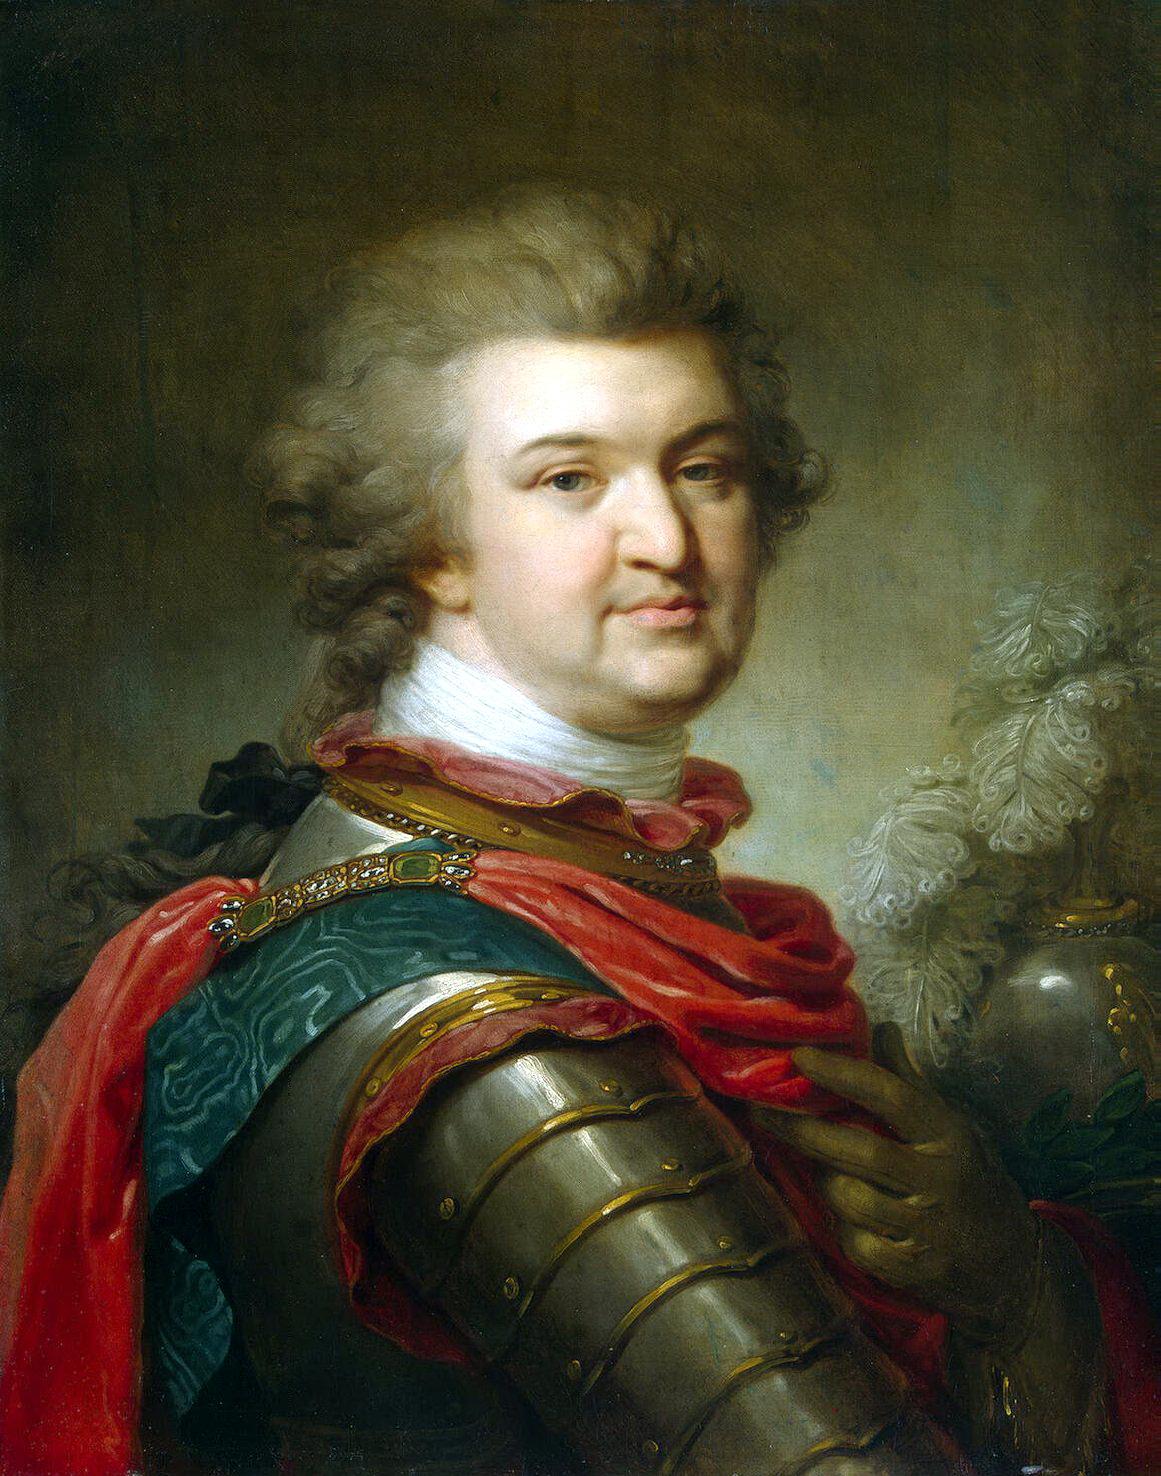 Друг князя Потемкина